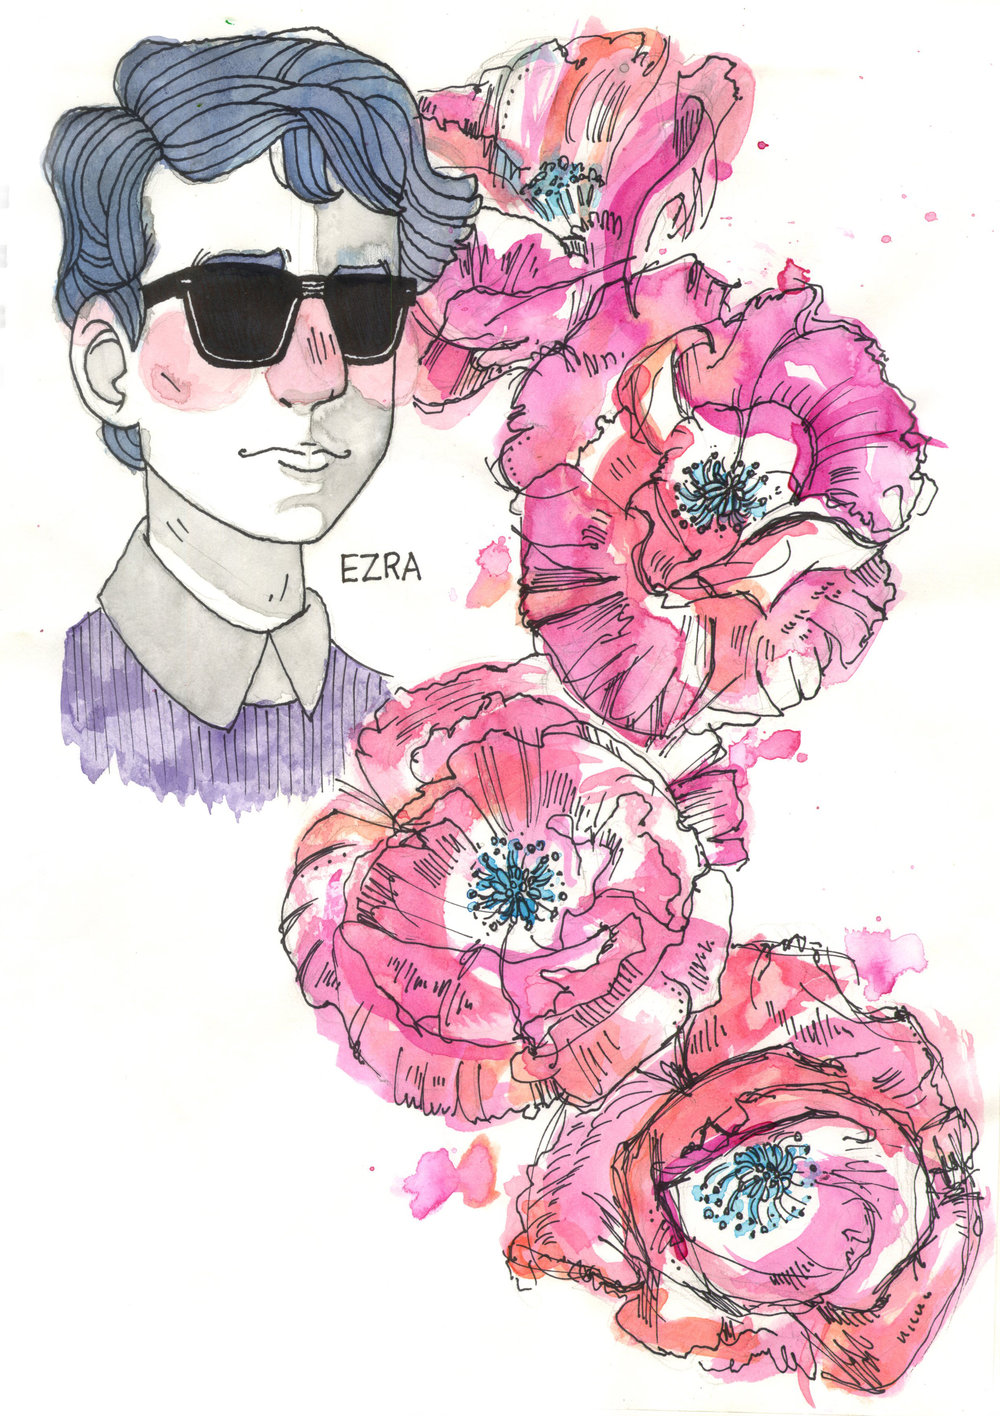 Ezra copy.jpg